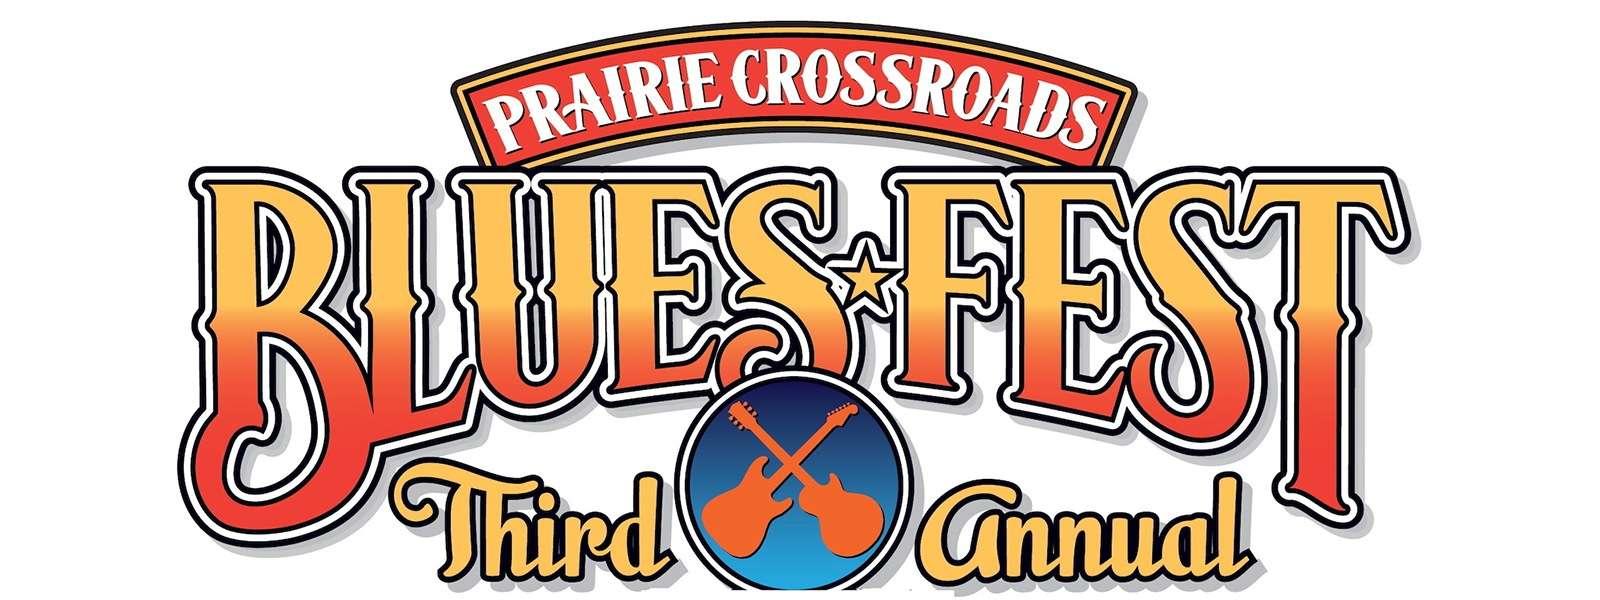 Prairie Crossroads Blues Fest